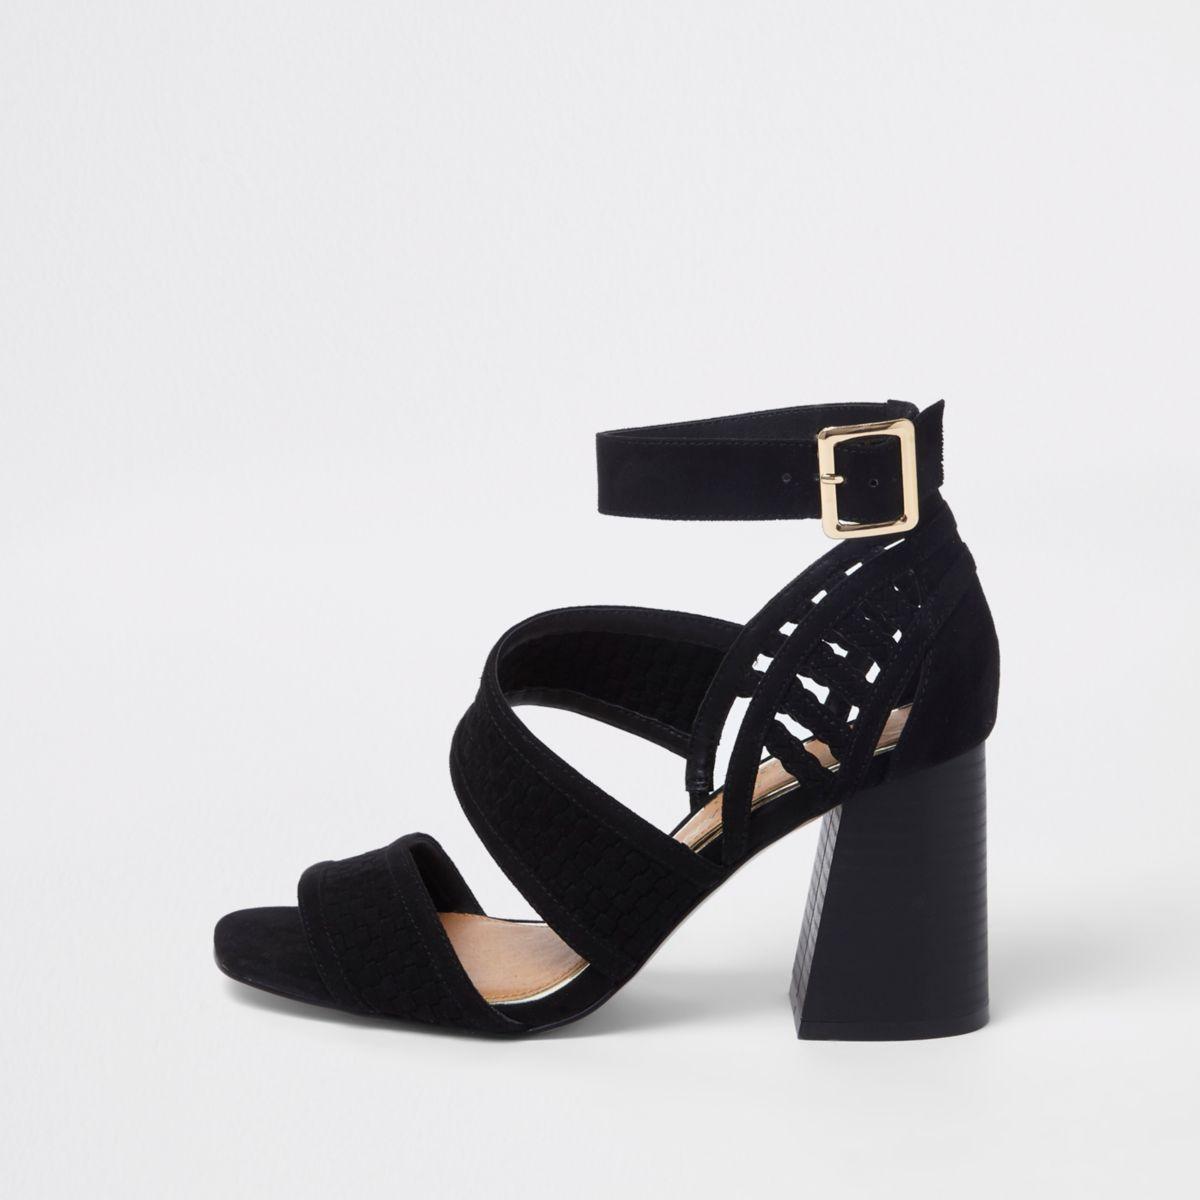 Black wide fit strappy block heel sandals